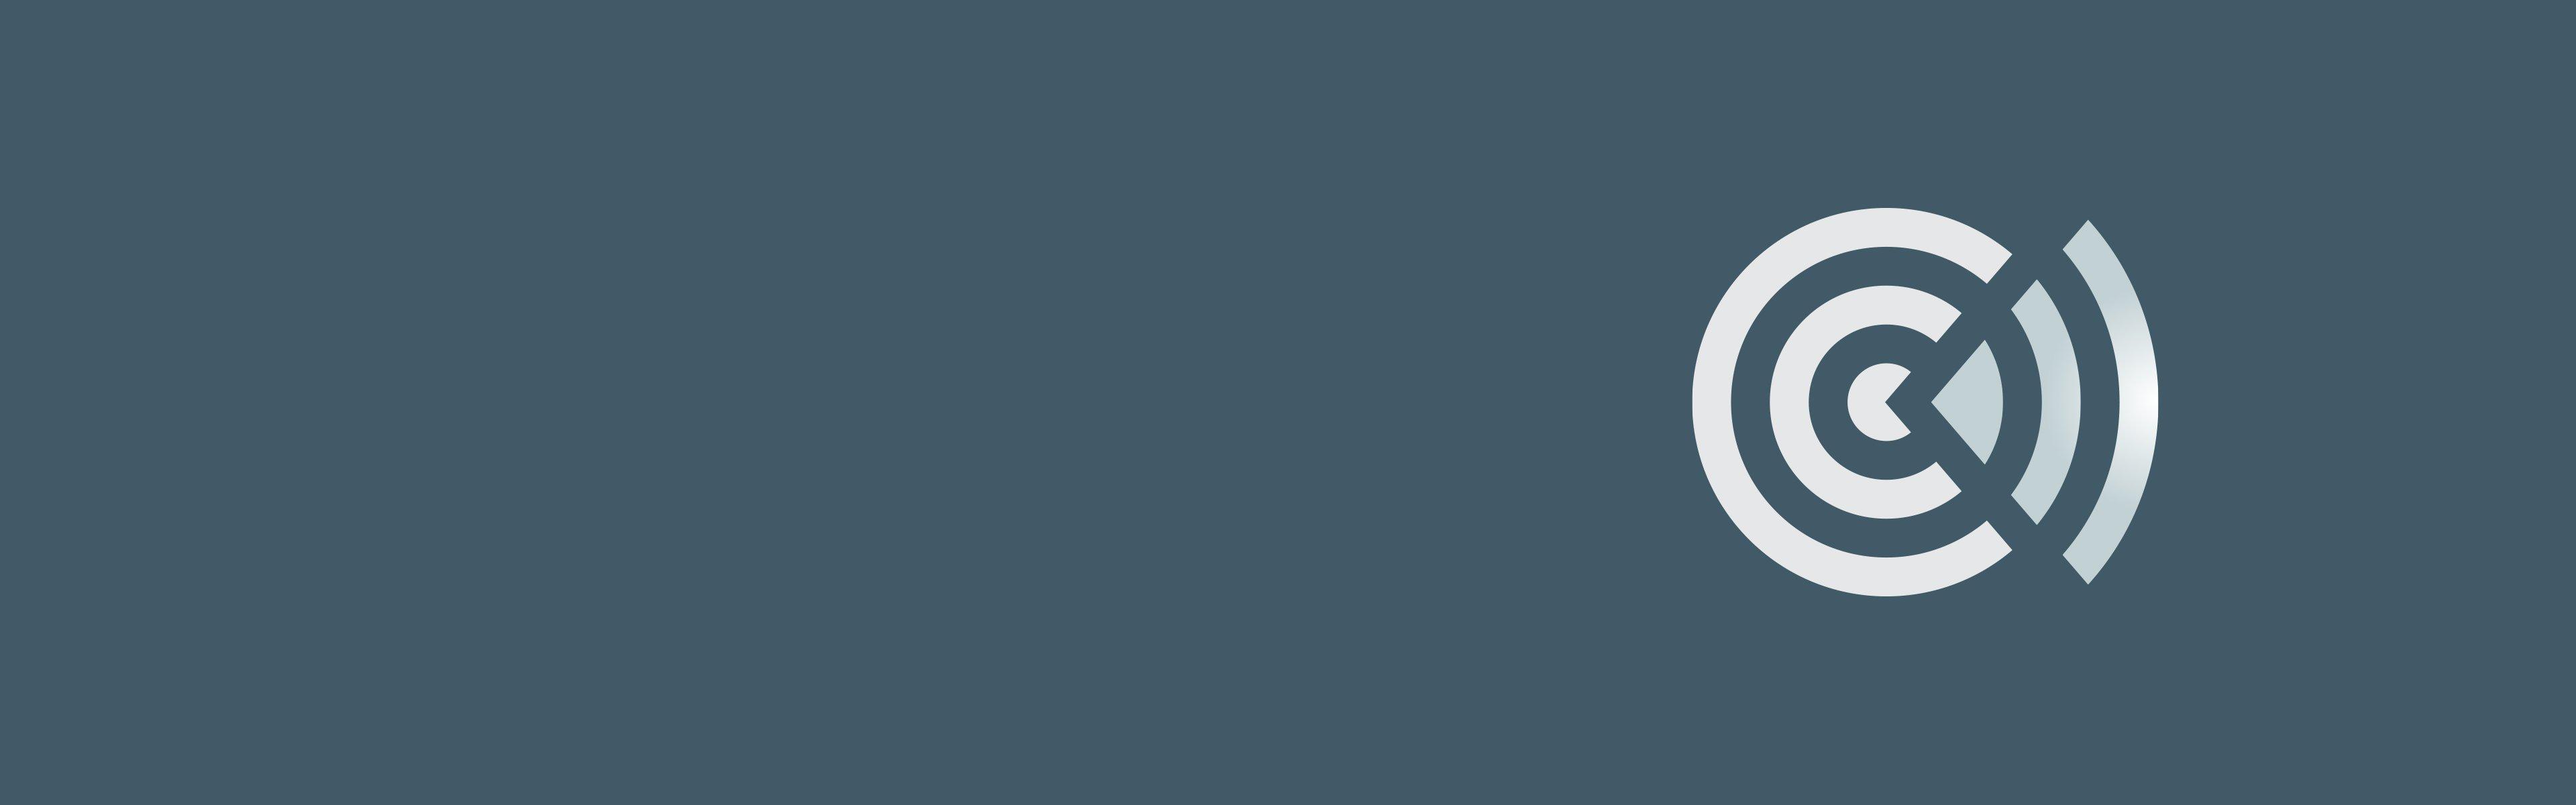 Extend Platform logo